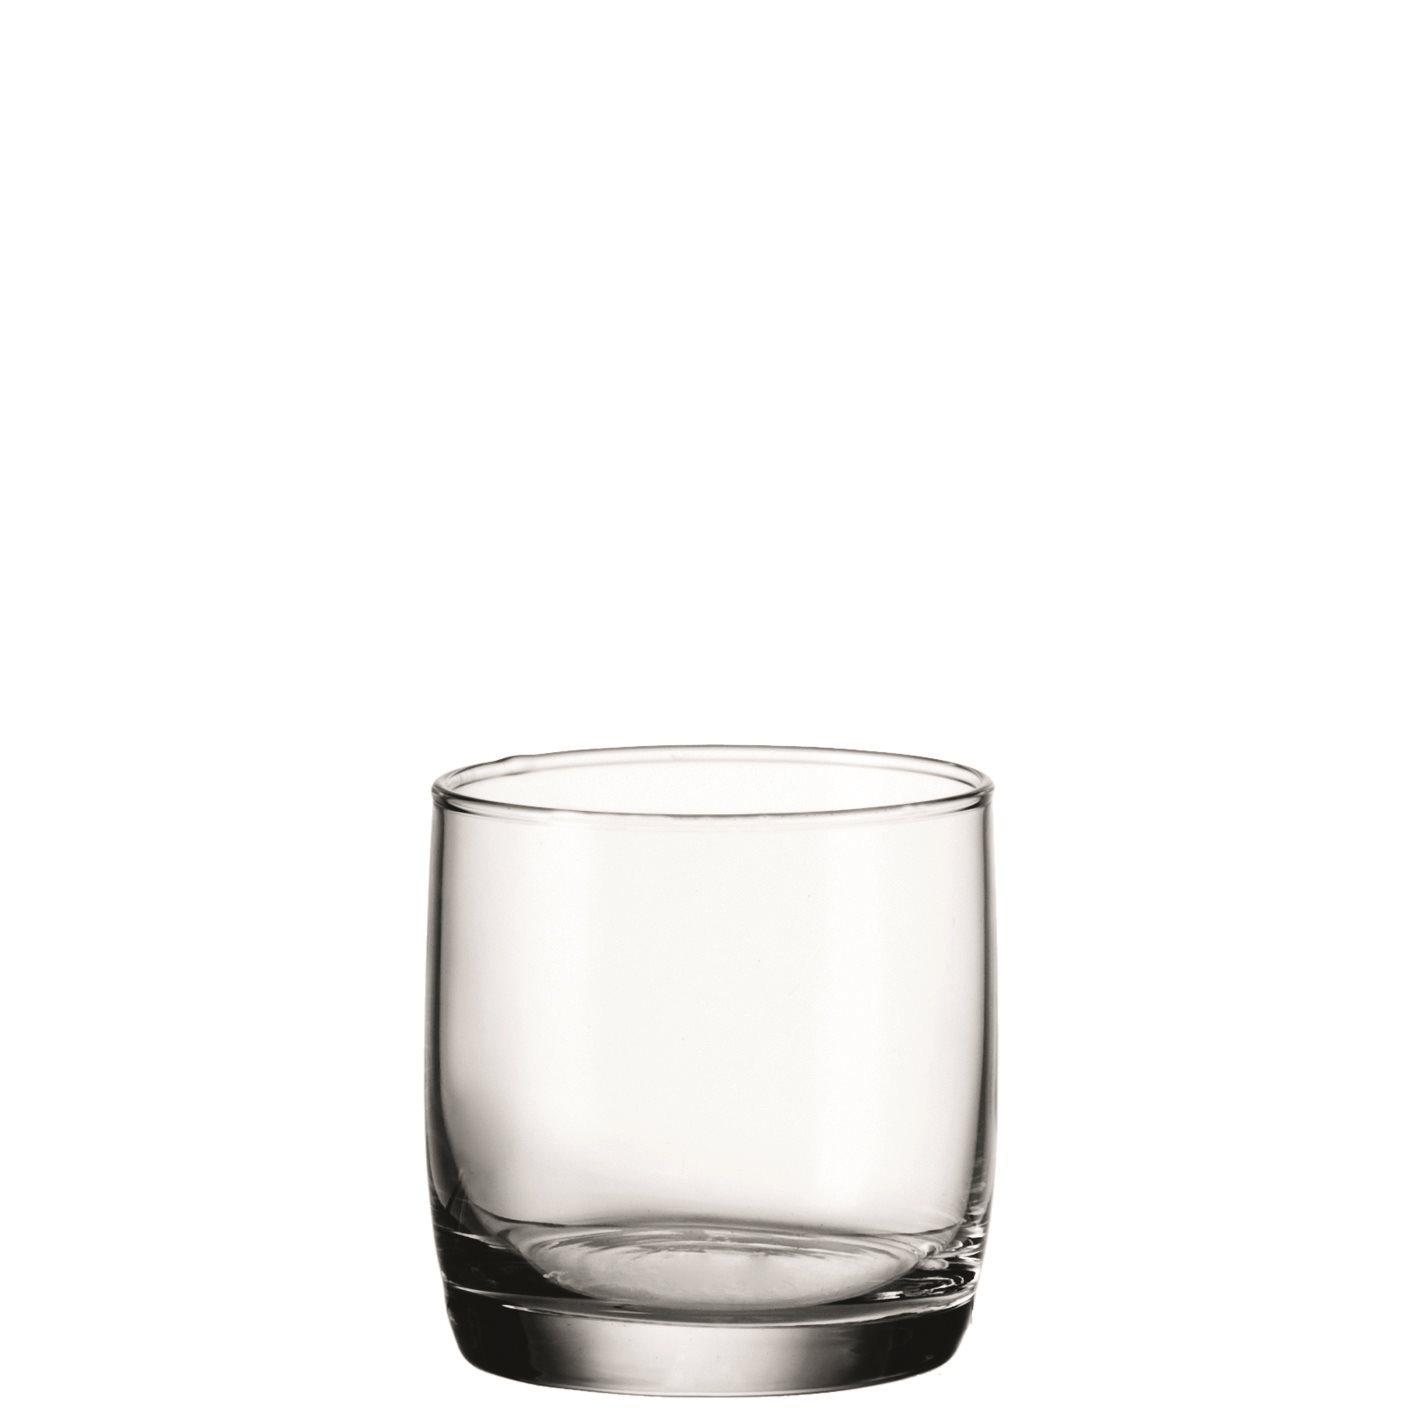 Montana Σετ 6 Ποτήρια Χυμού Ουίσκι Selection 300ml